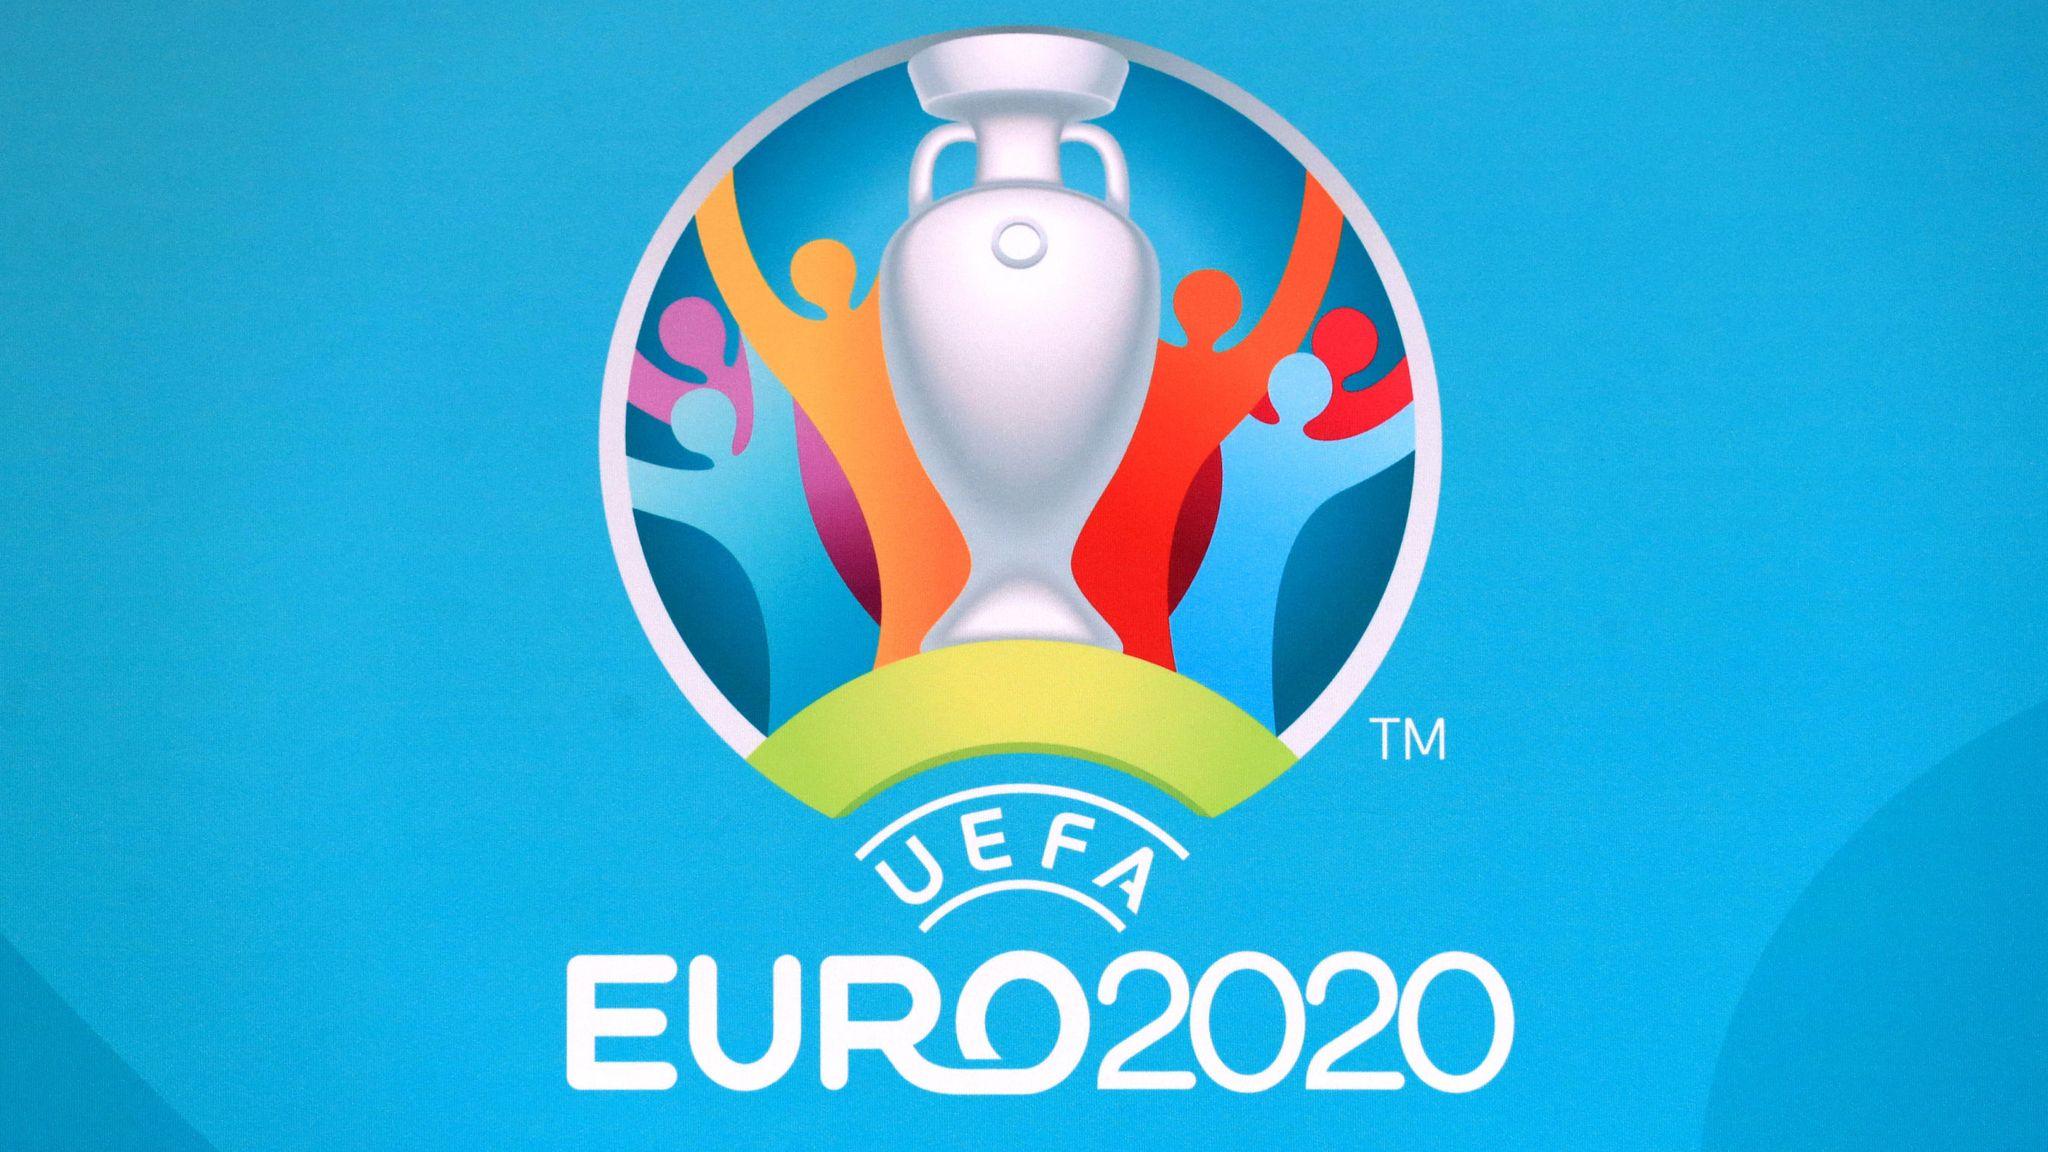 Euro 2020: What do we know? | Football News | Sky Sports